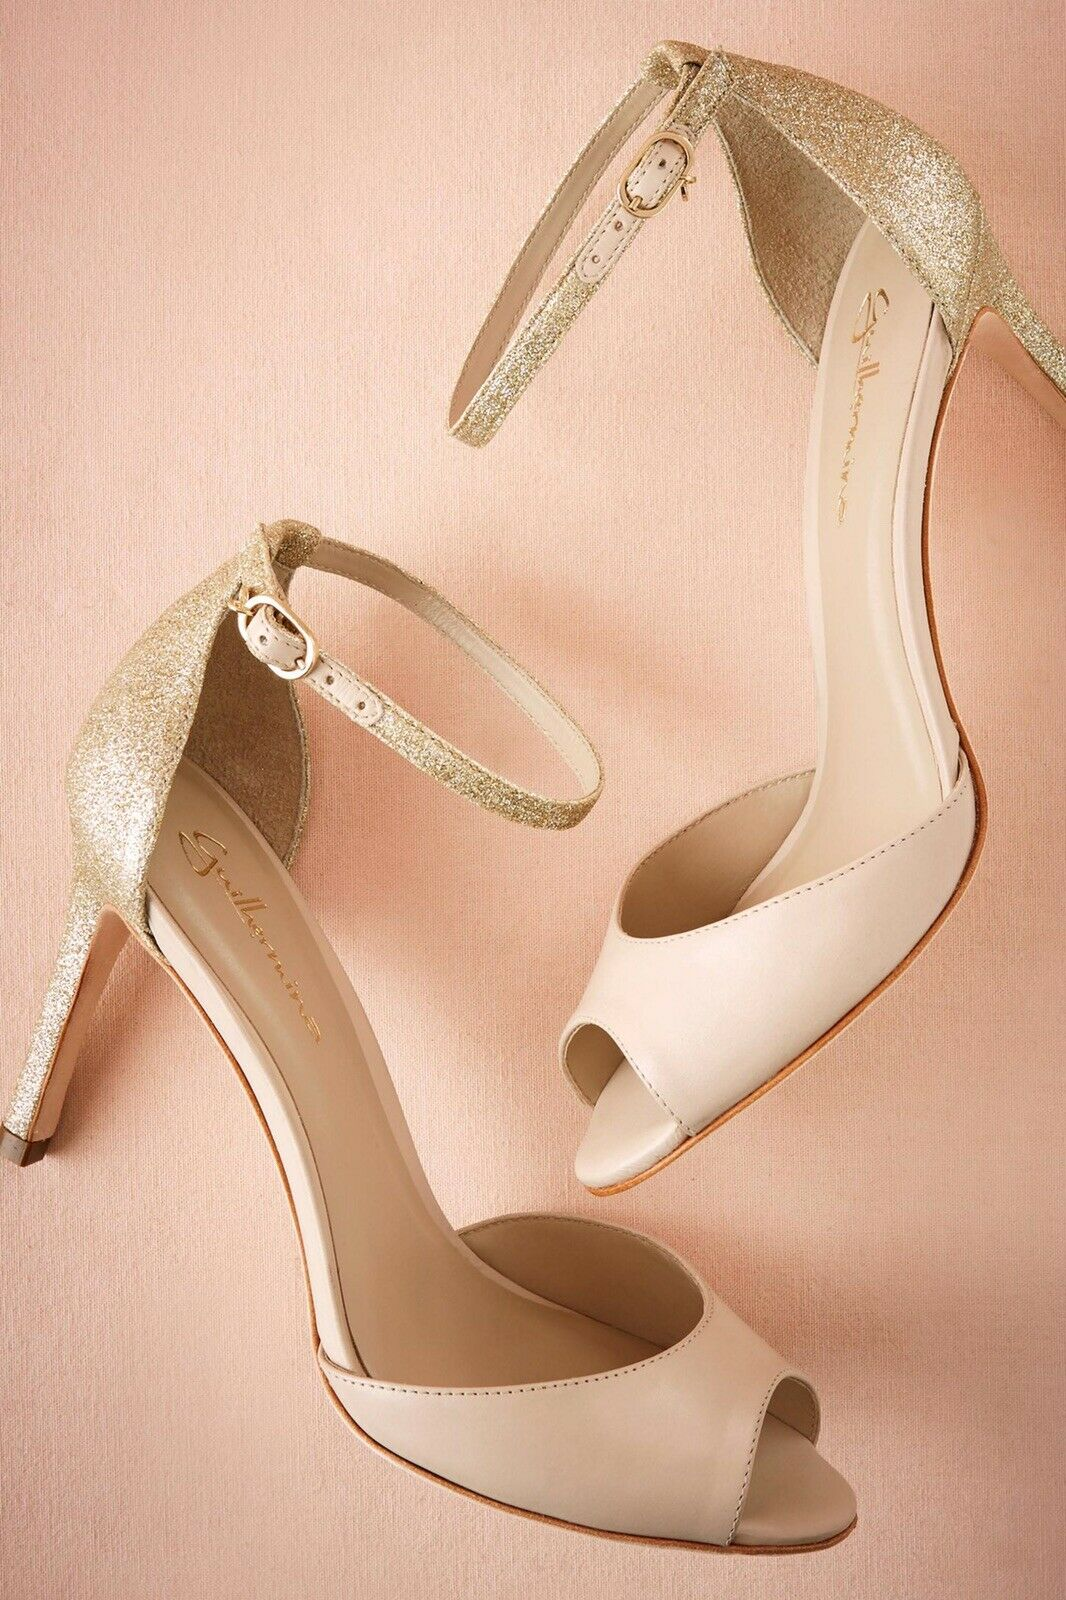 Chandon Heel Sandal By Guihermina Größe 8 39